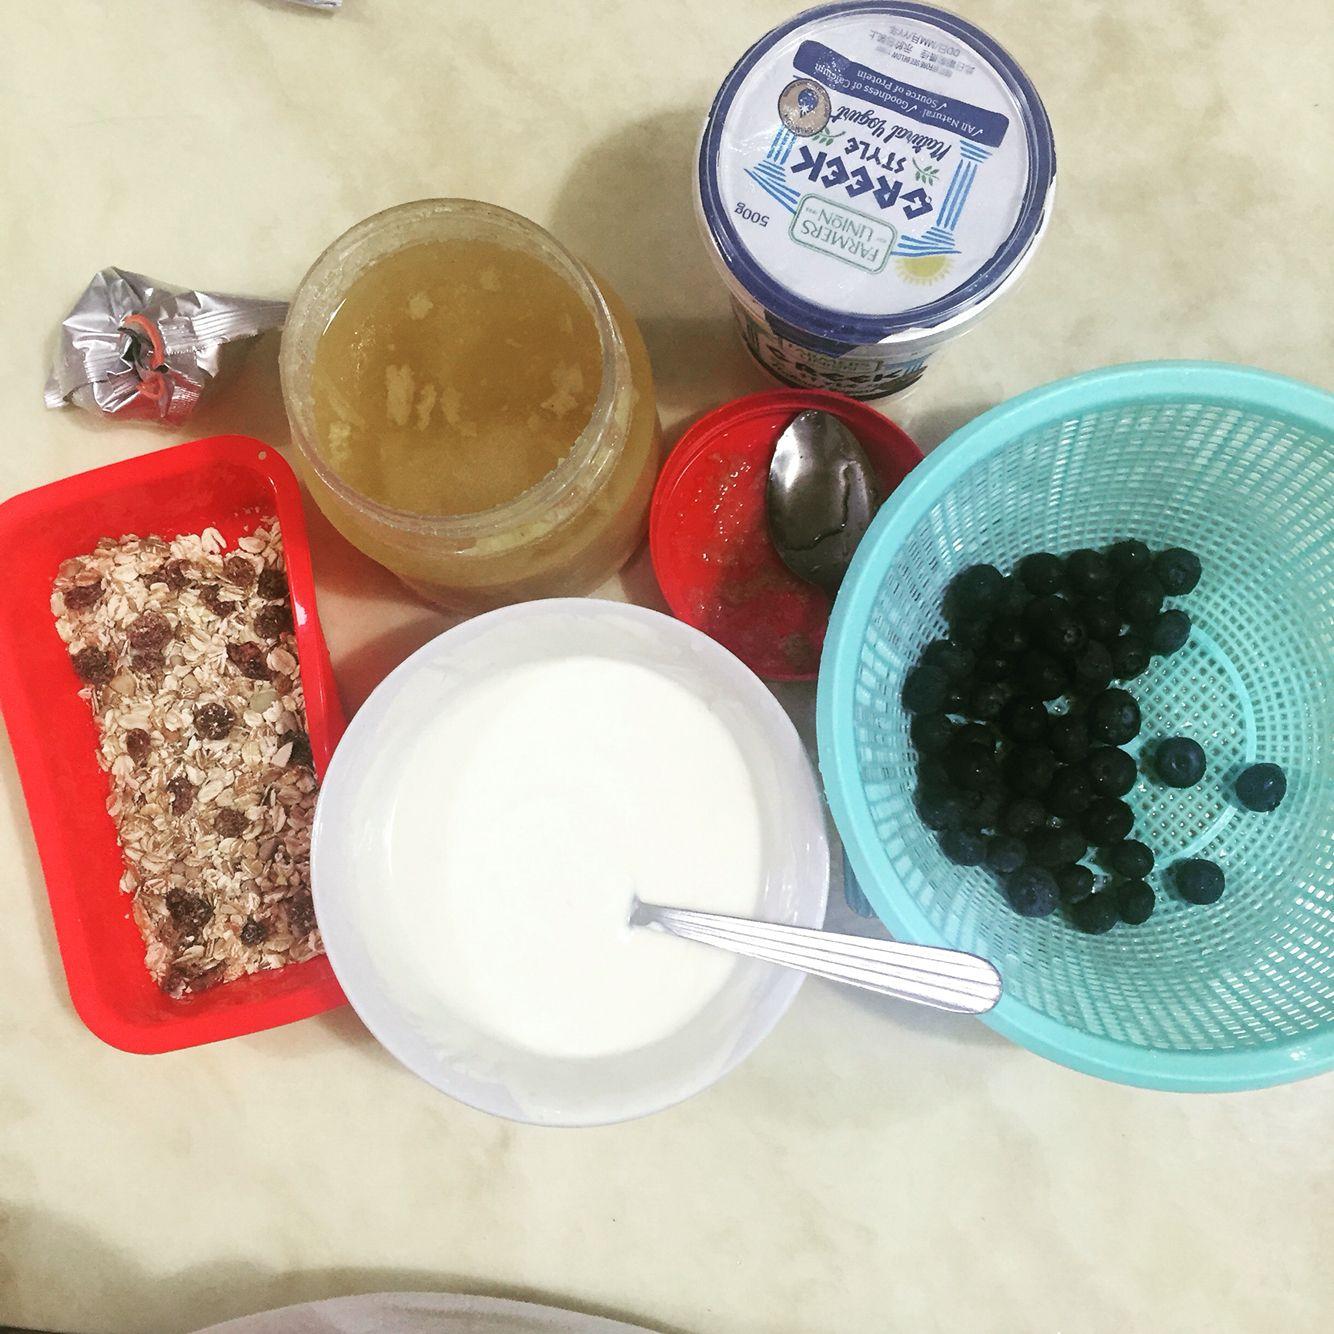 Frozen Yogurt bites  -Greek yogurt mixed with 2 tablespoons of honey  -fitness cereal  -fresh blueberries  N froze 3hours